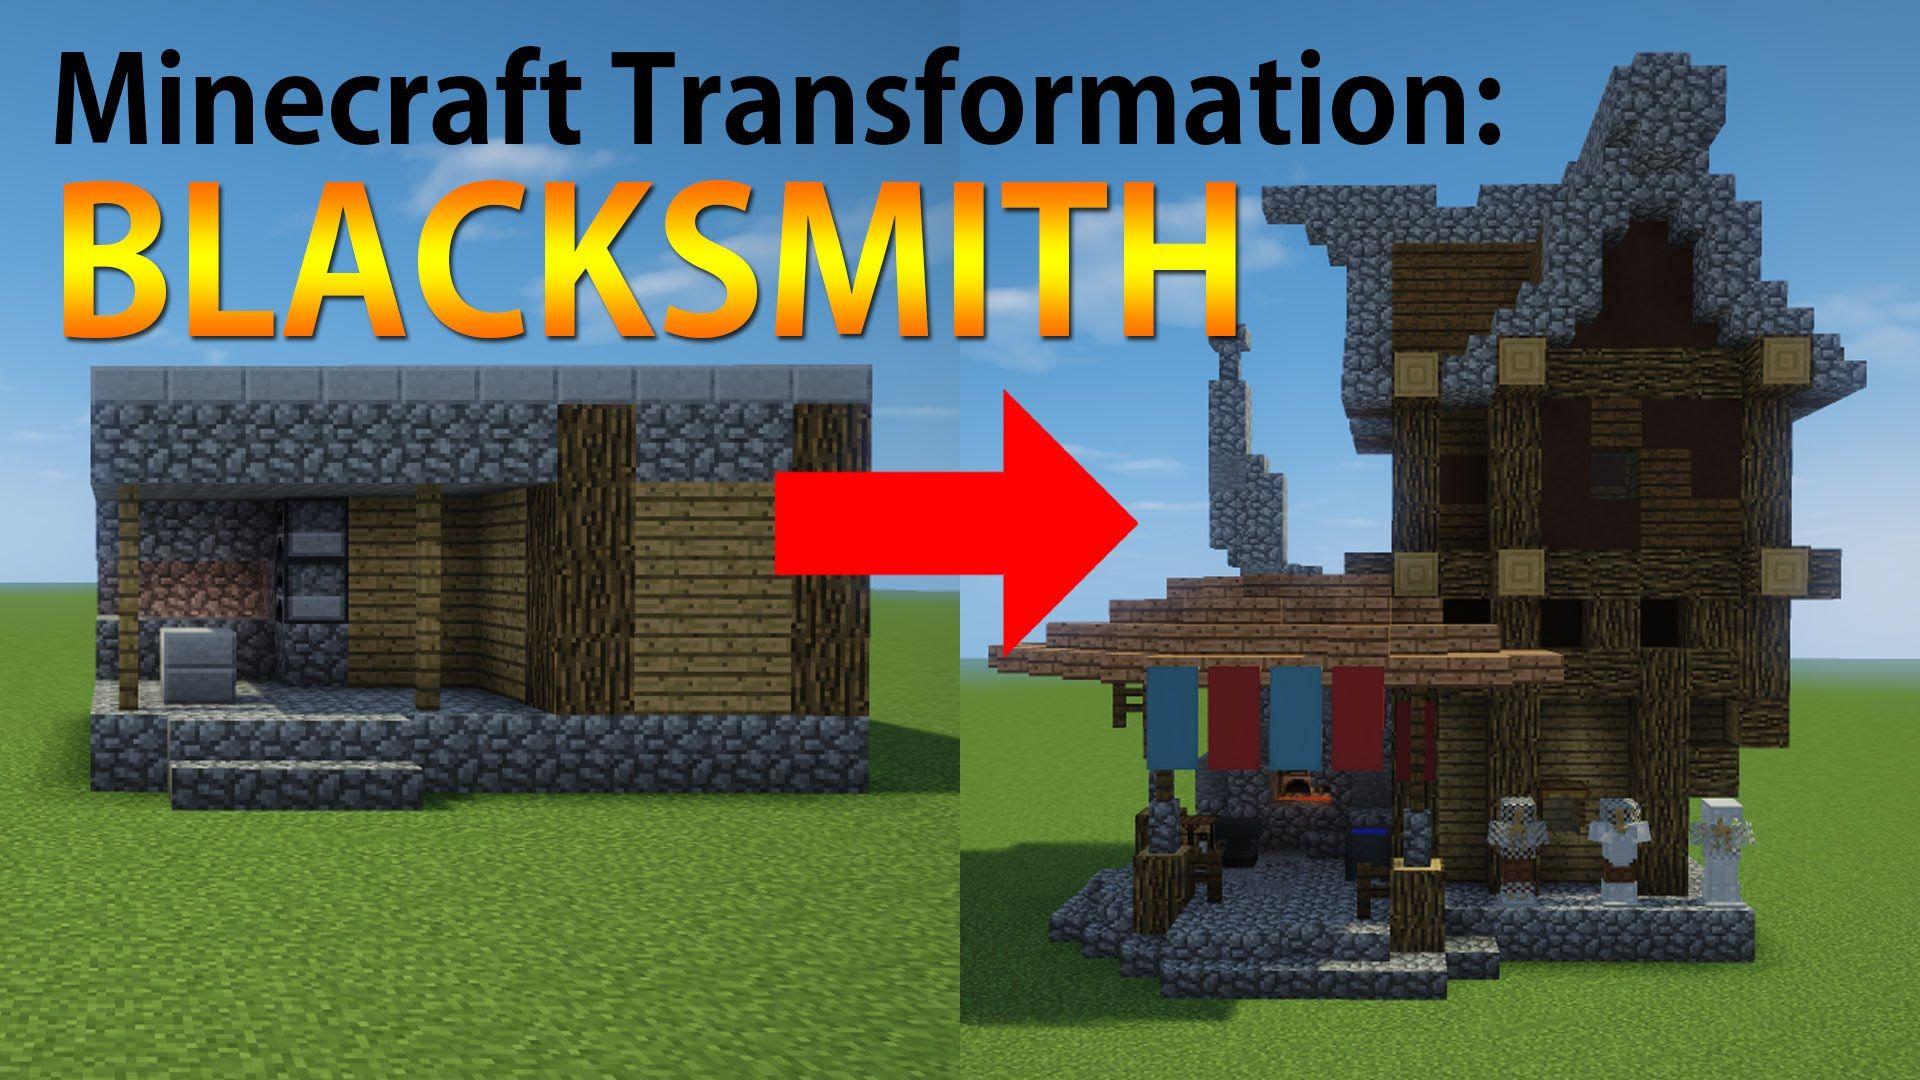 Blacksmith Shop Minecraft